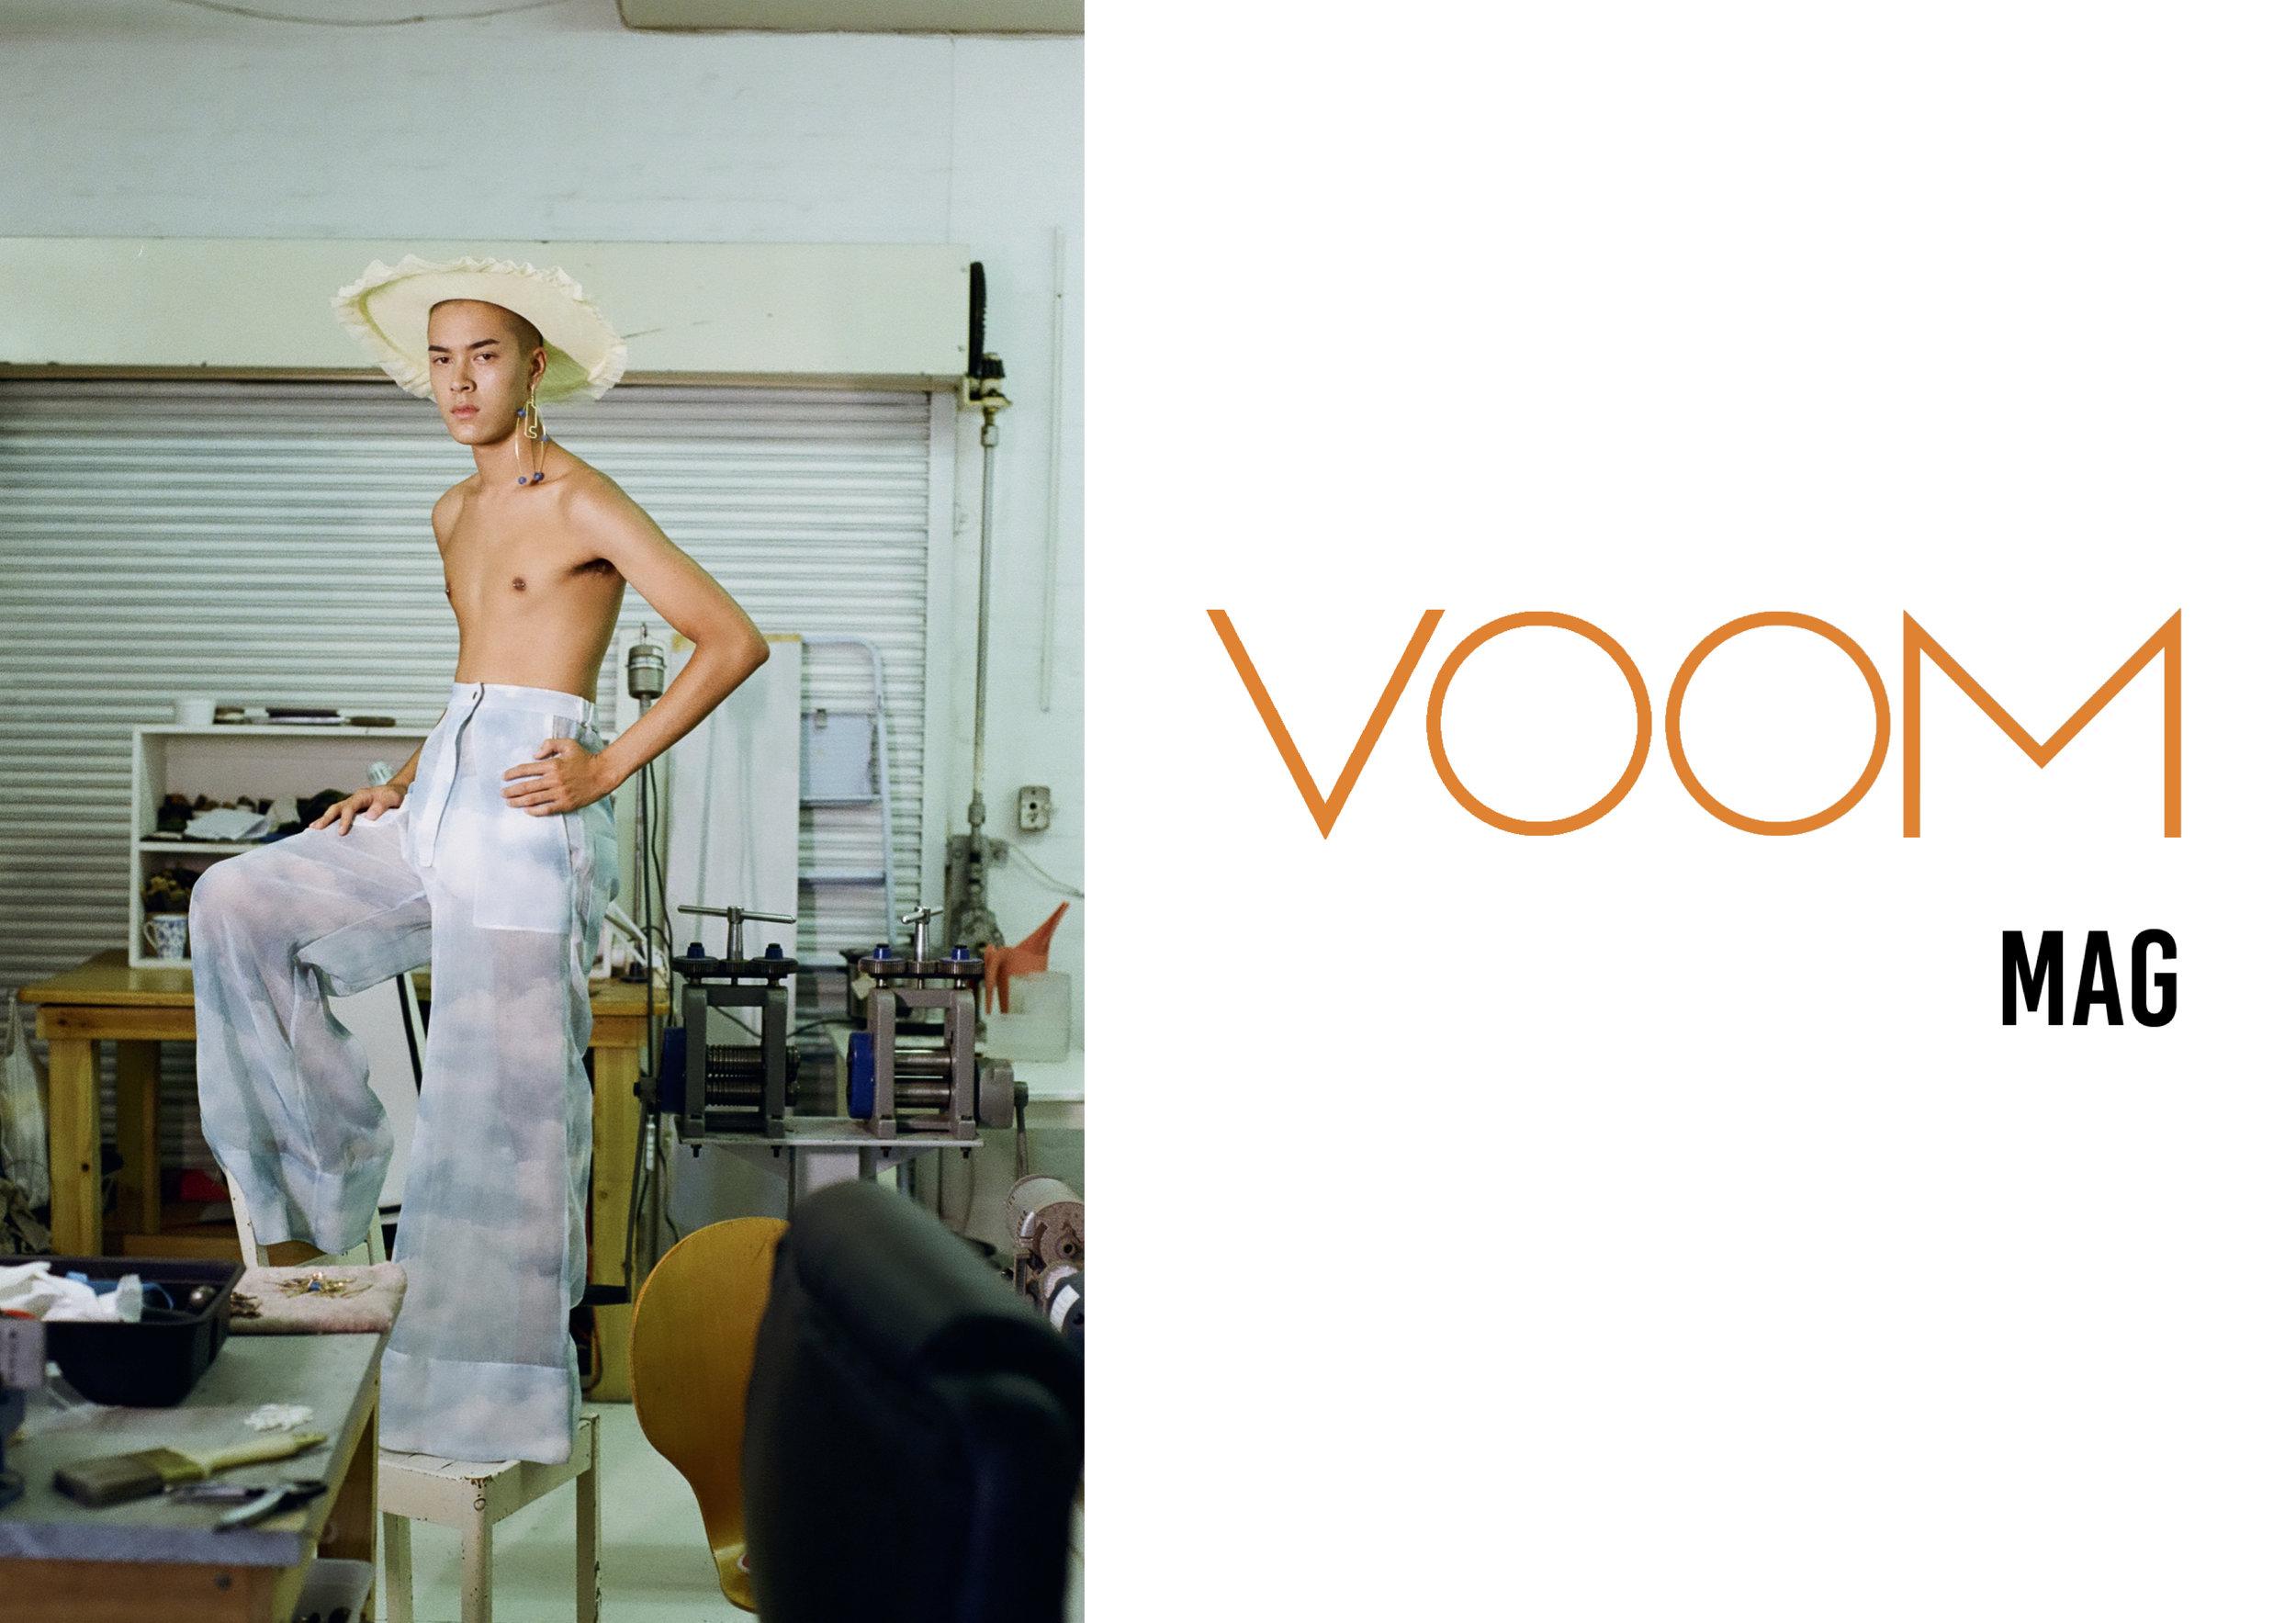 VOOM Magazine #4